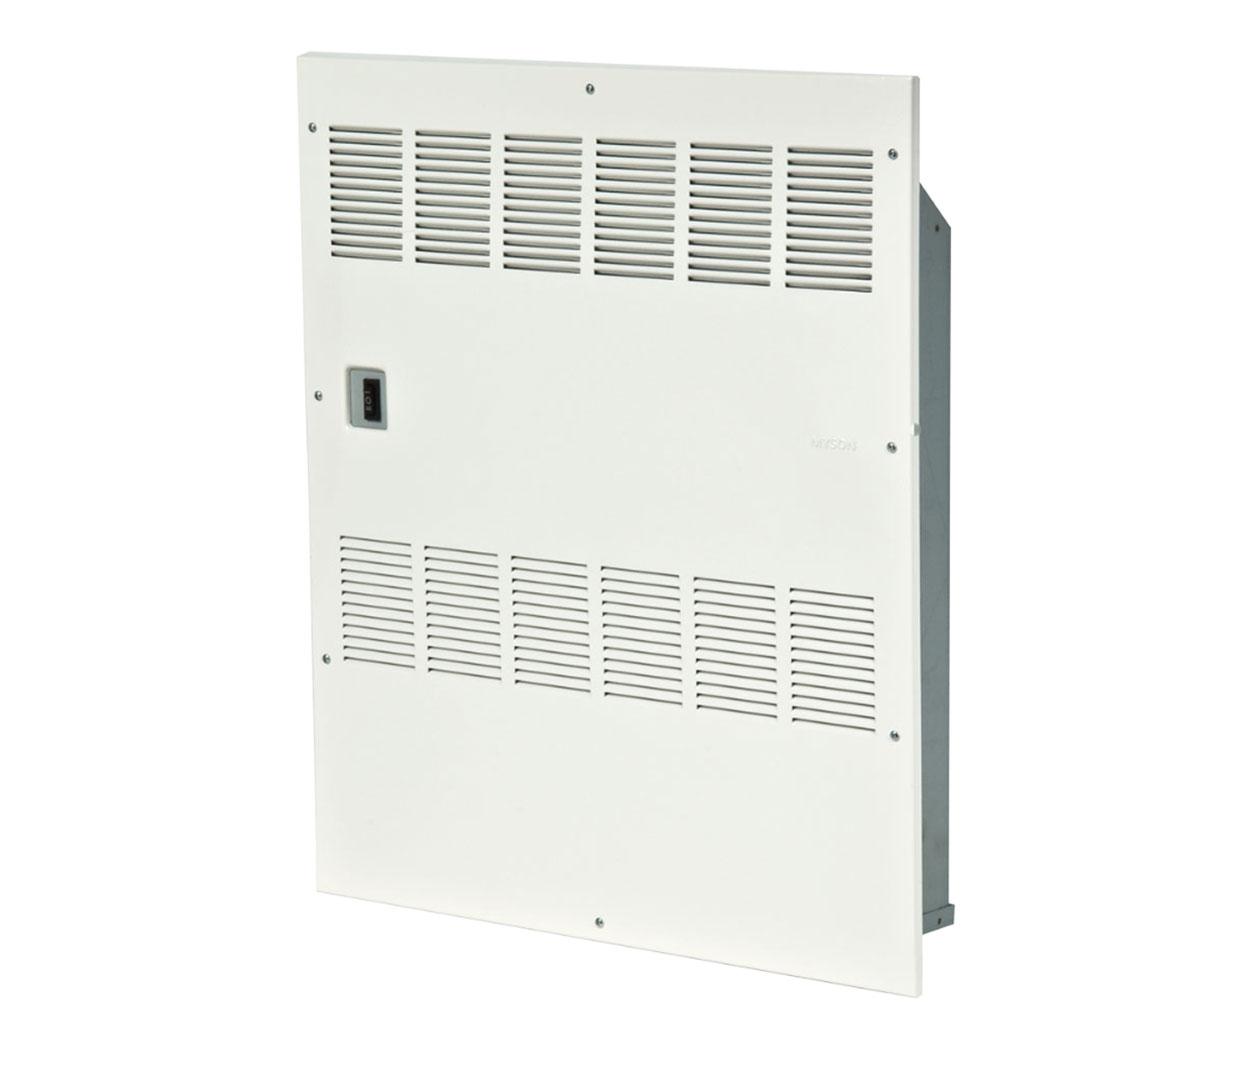 Myson Fan Convectors Whispa 9000rcu Iii Wall Convector Sime Boiler Wiring Diagram Recessed